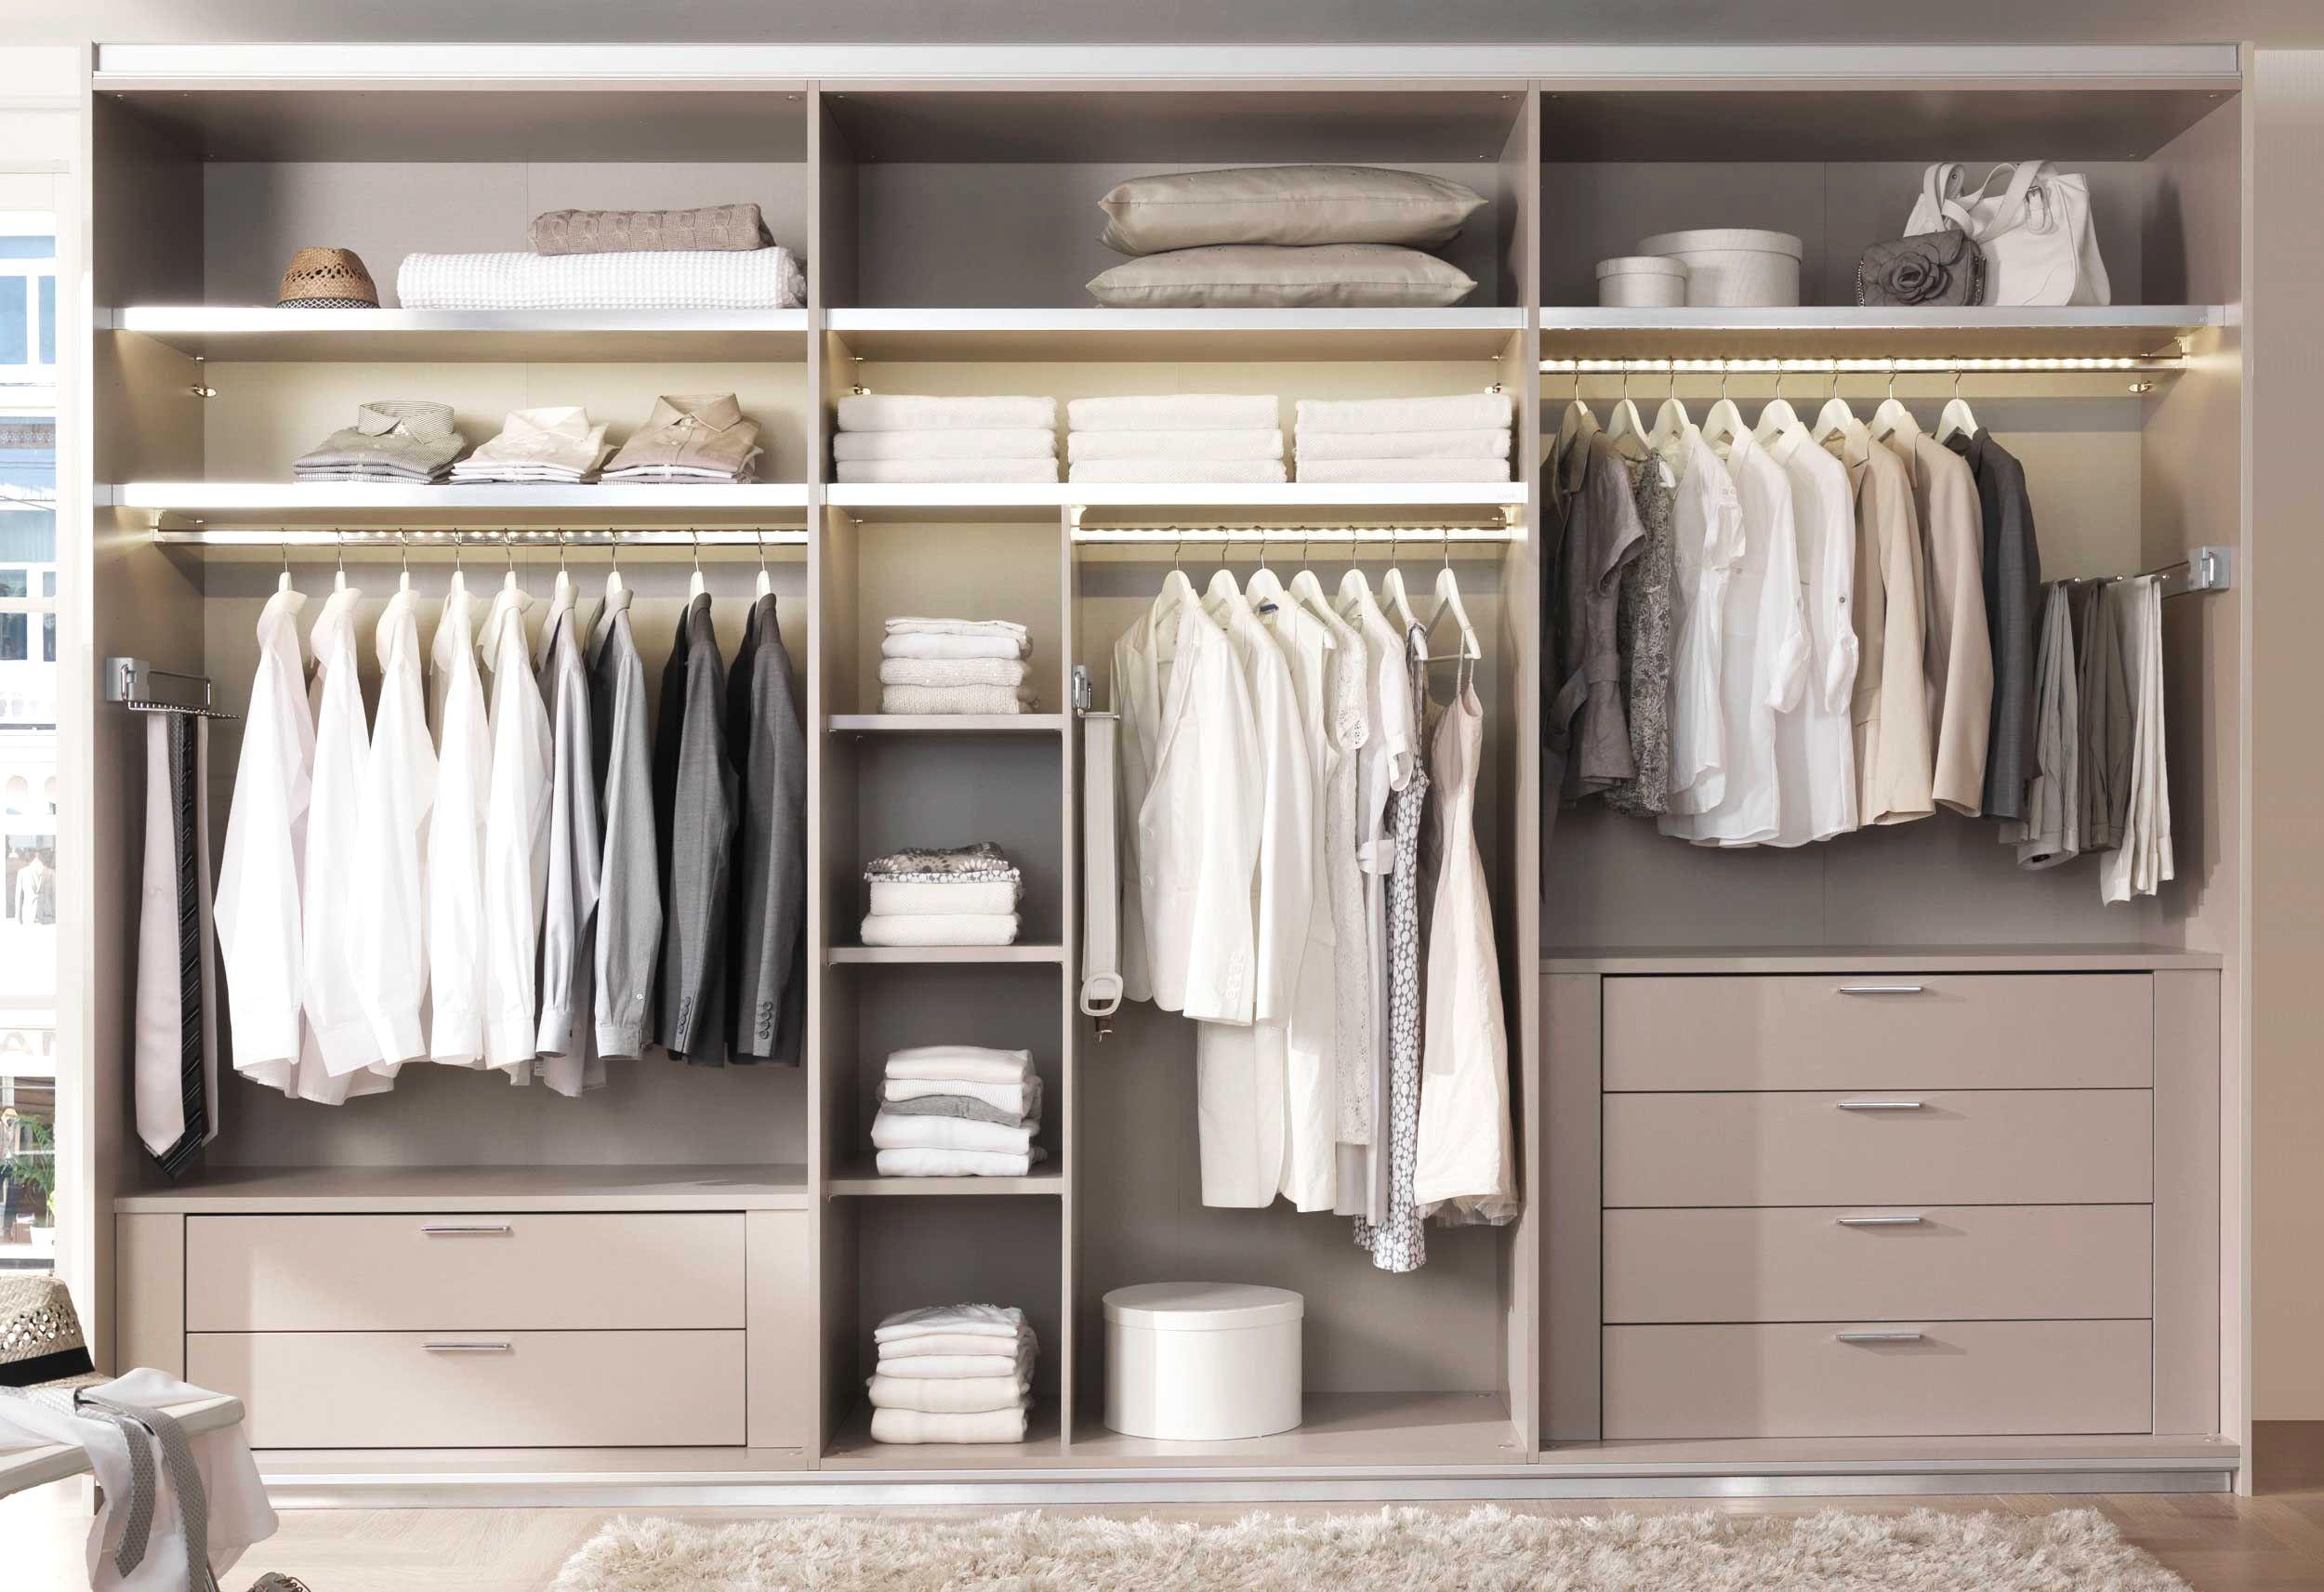 Schon Kleiderschrank Innen Kleiderschrank Innenausstattung